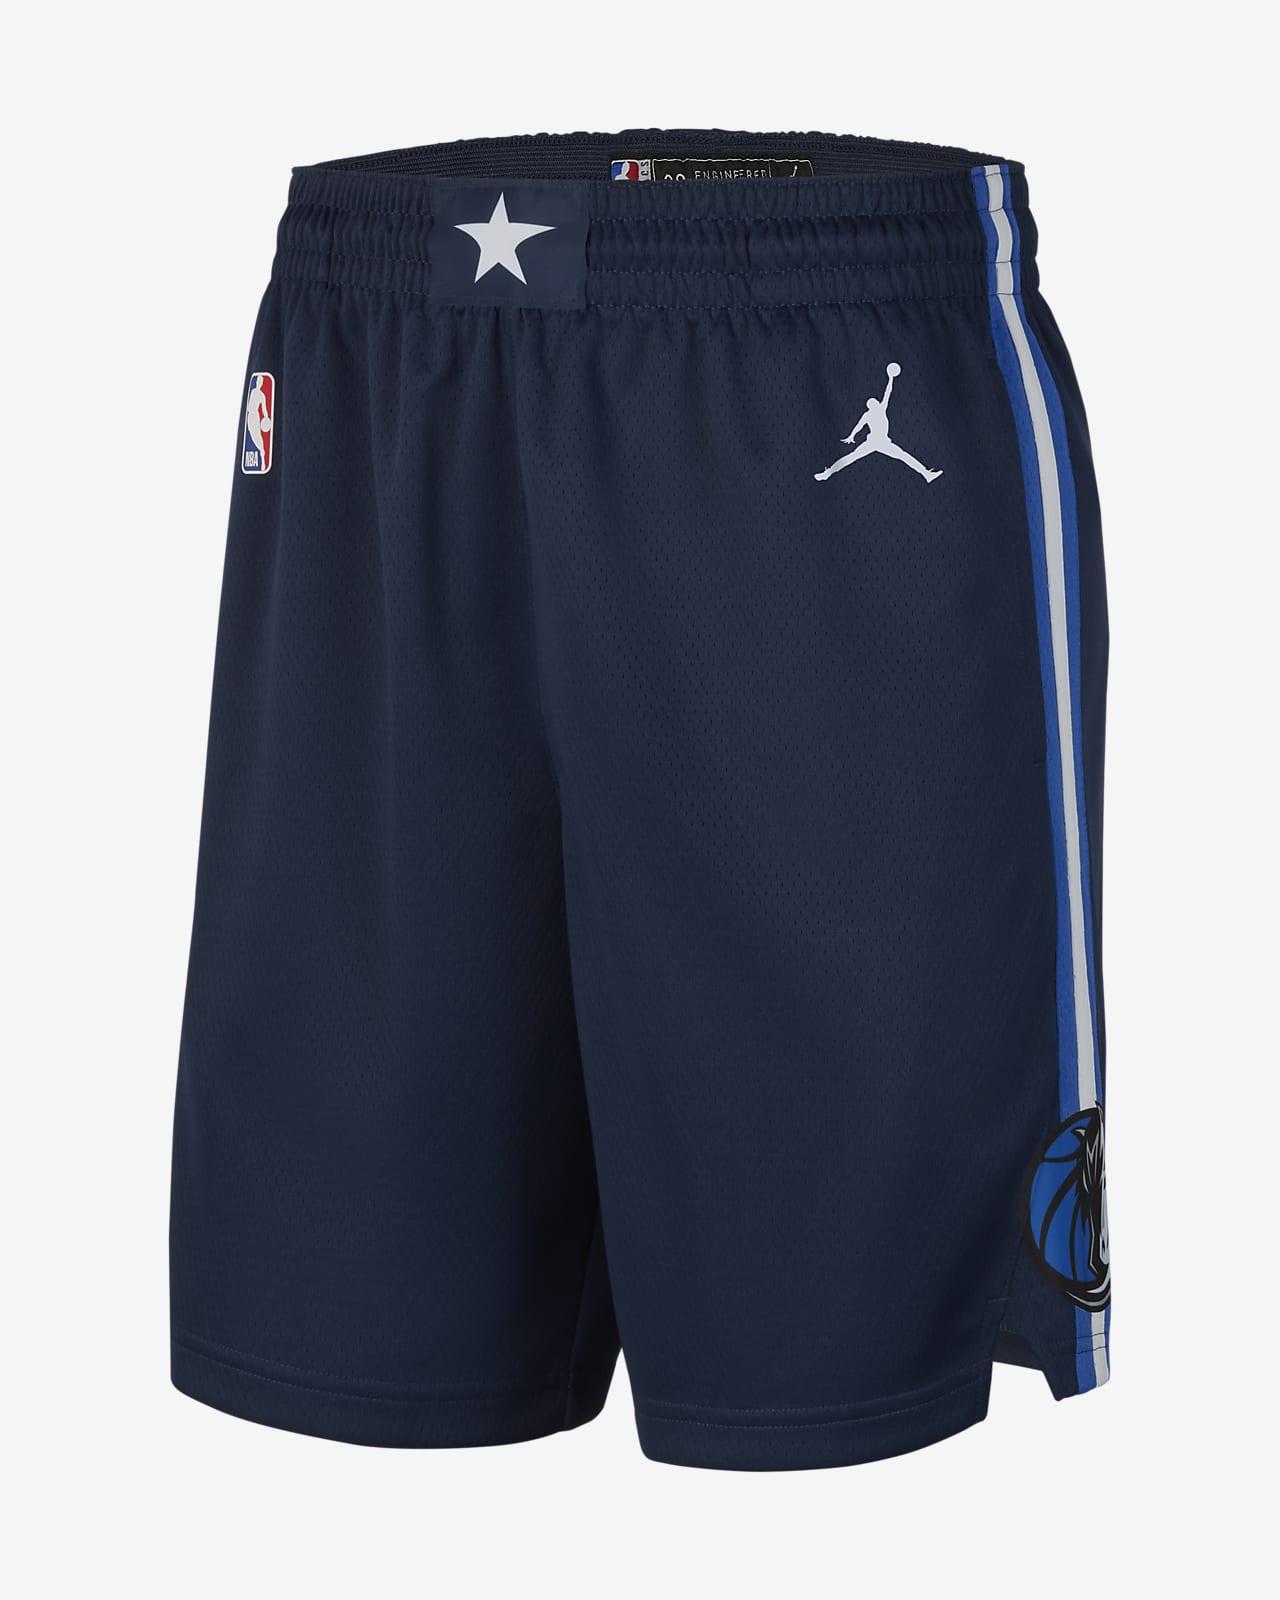 Short Jordan NBA Swingman Mavericks Statement Edition 2020 pour Homme